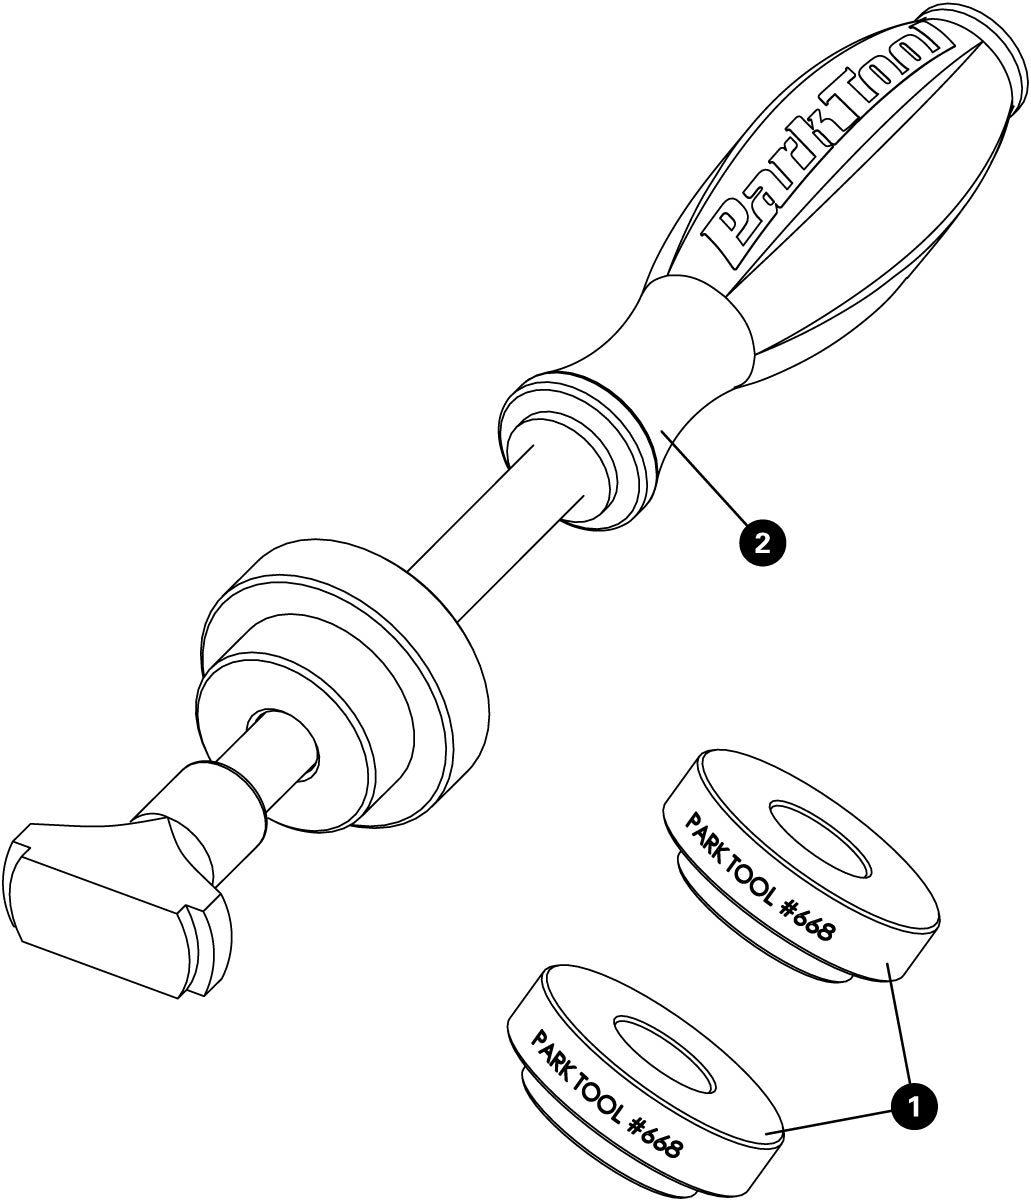 Parts diagram for BBT-30.4 Bottom Bracket Bearing Tool Set, click to enlarge